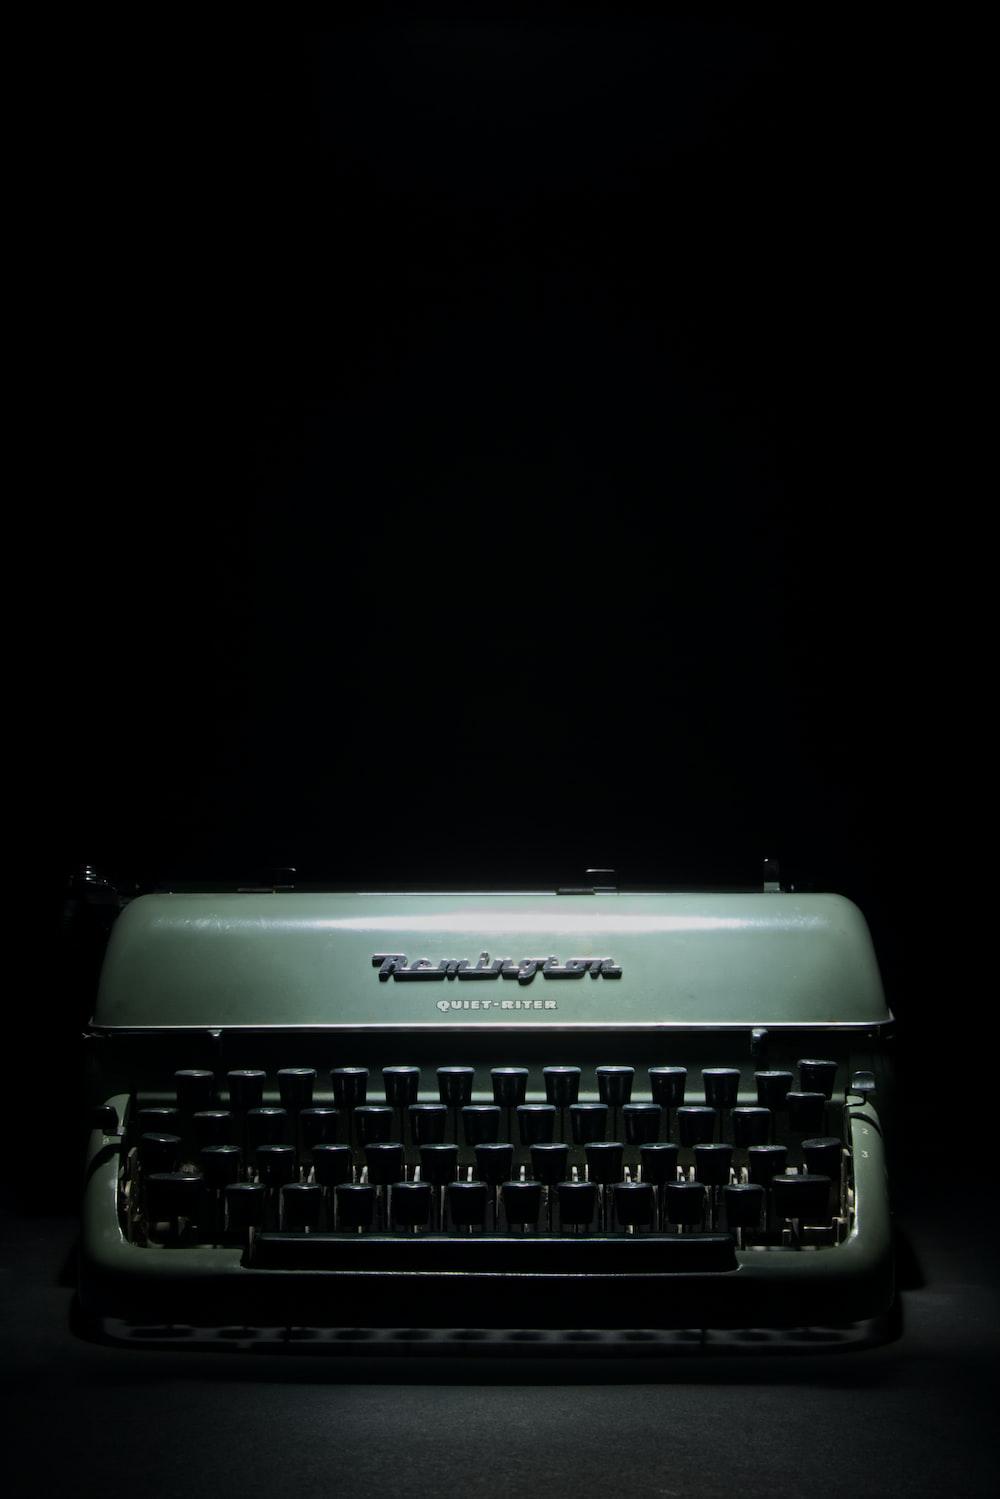 gray and black typewriter on black background